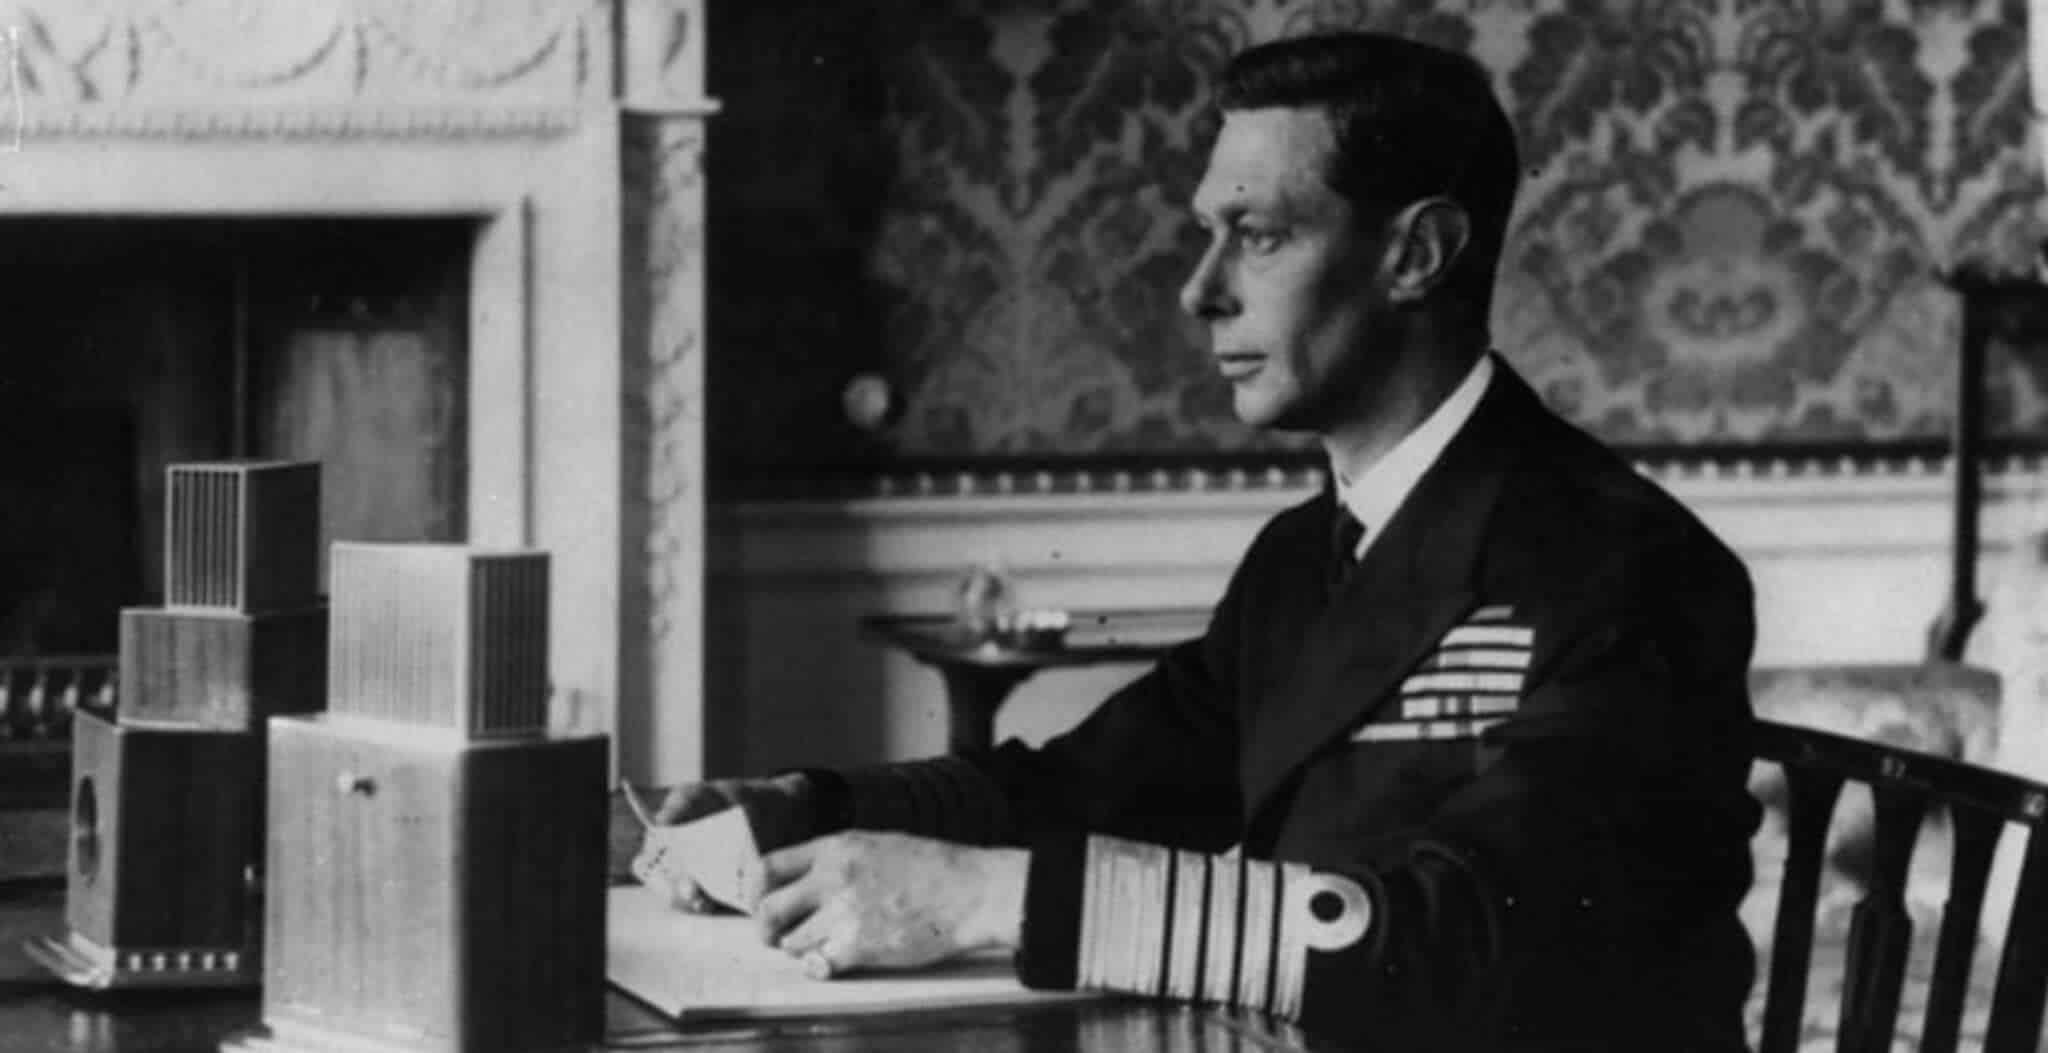 The Kings Speech Transcript for King George VI